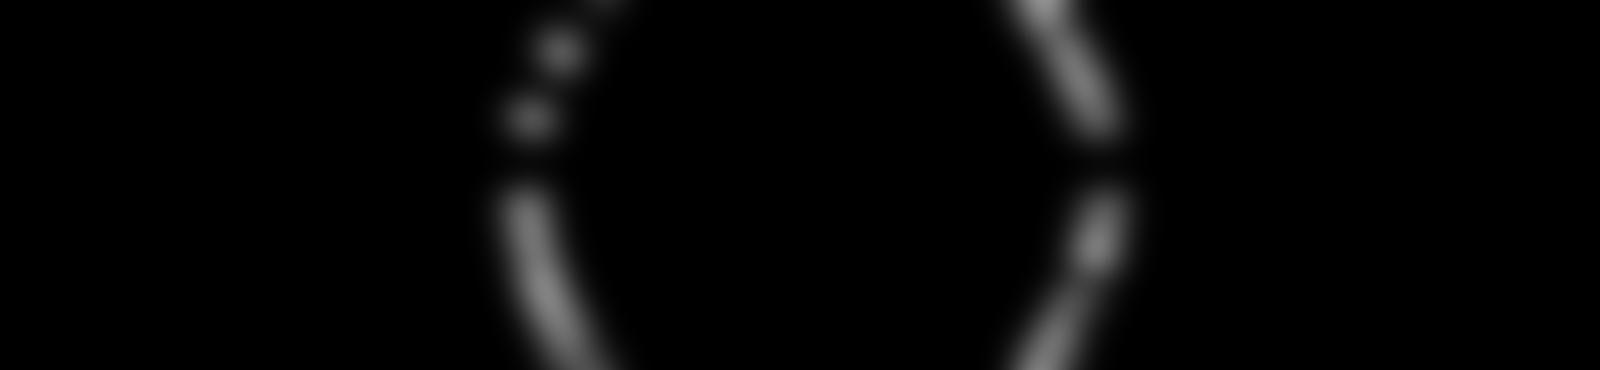 Blurred 7a43ad8e 4c7b 41df b4ee d8afc0d73c5f